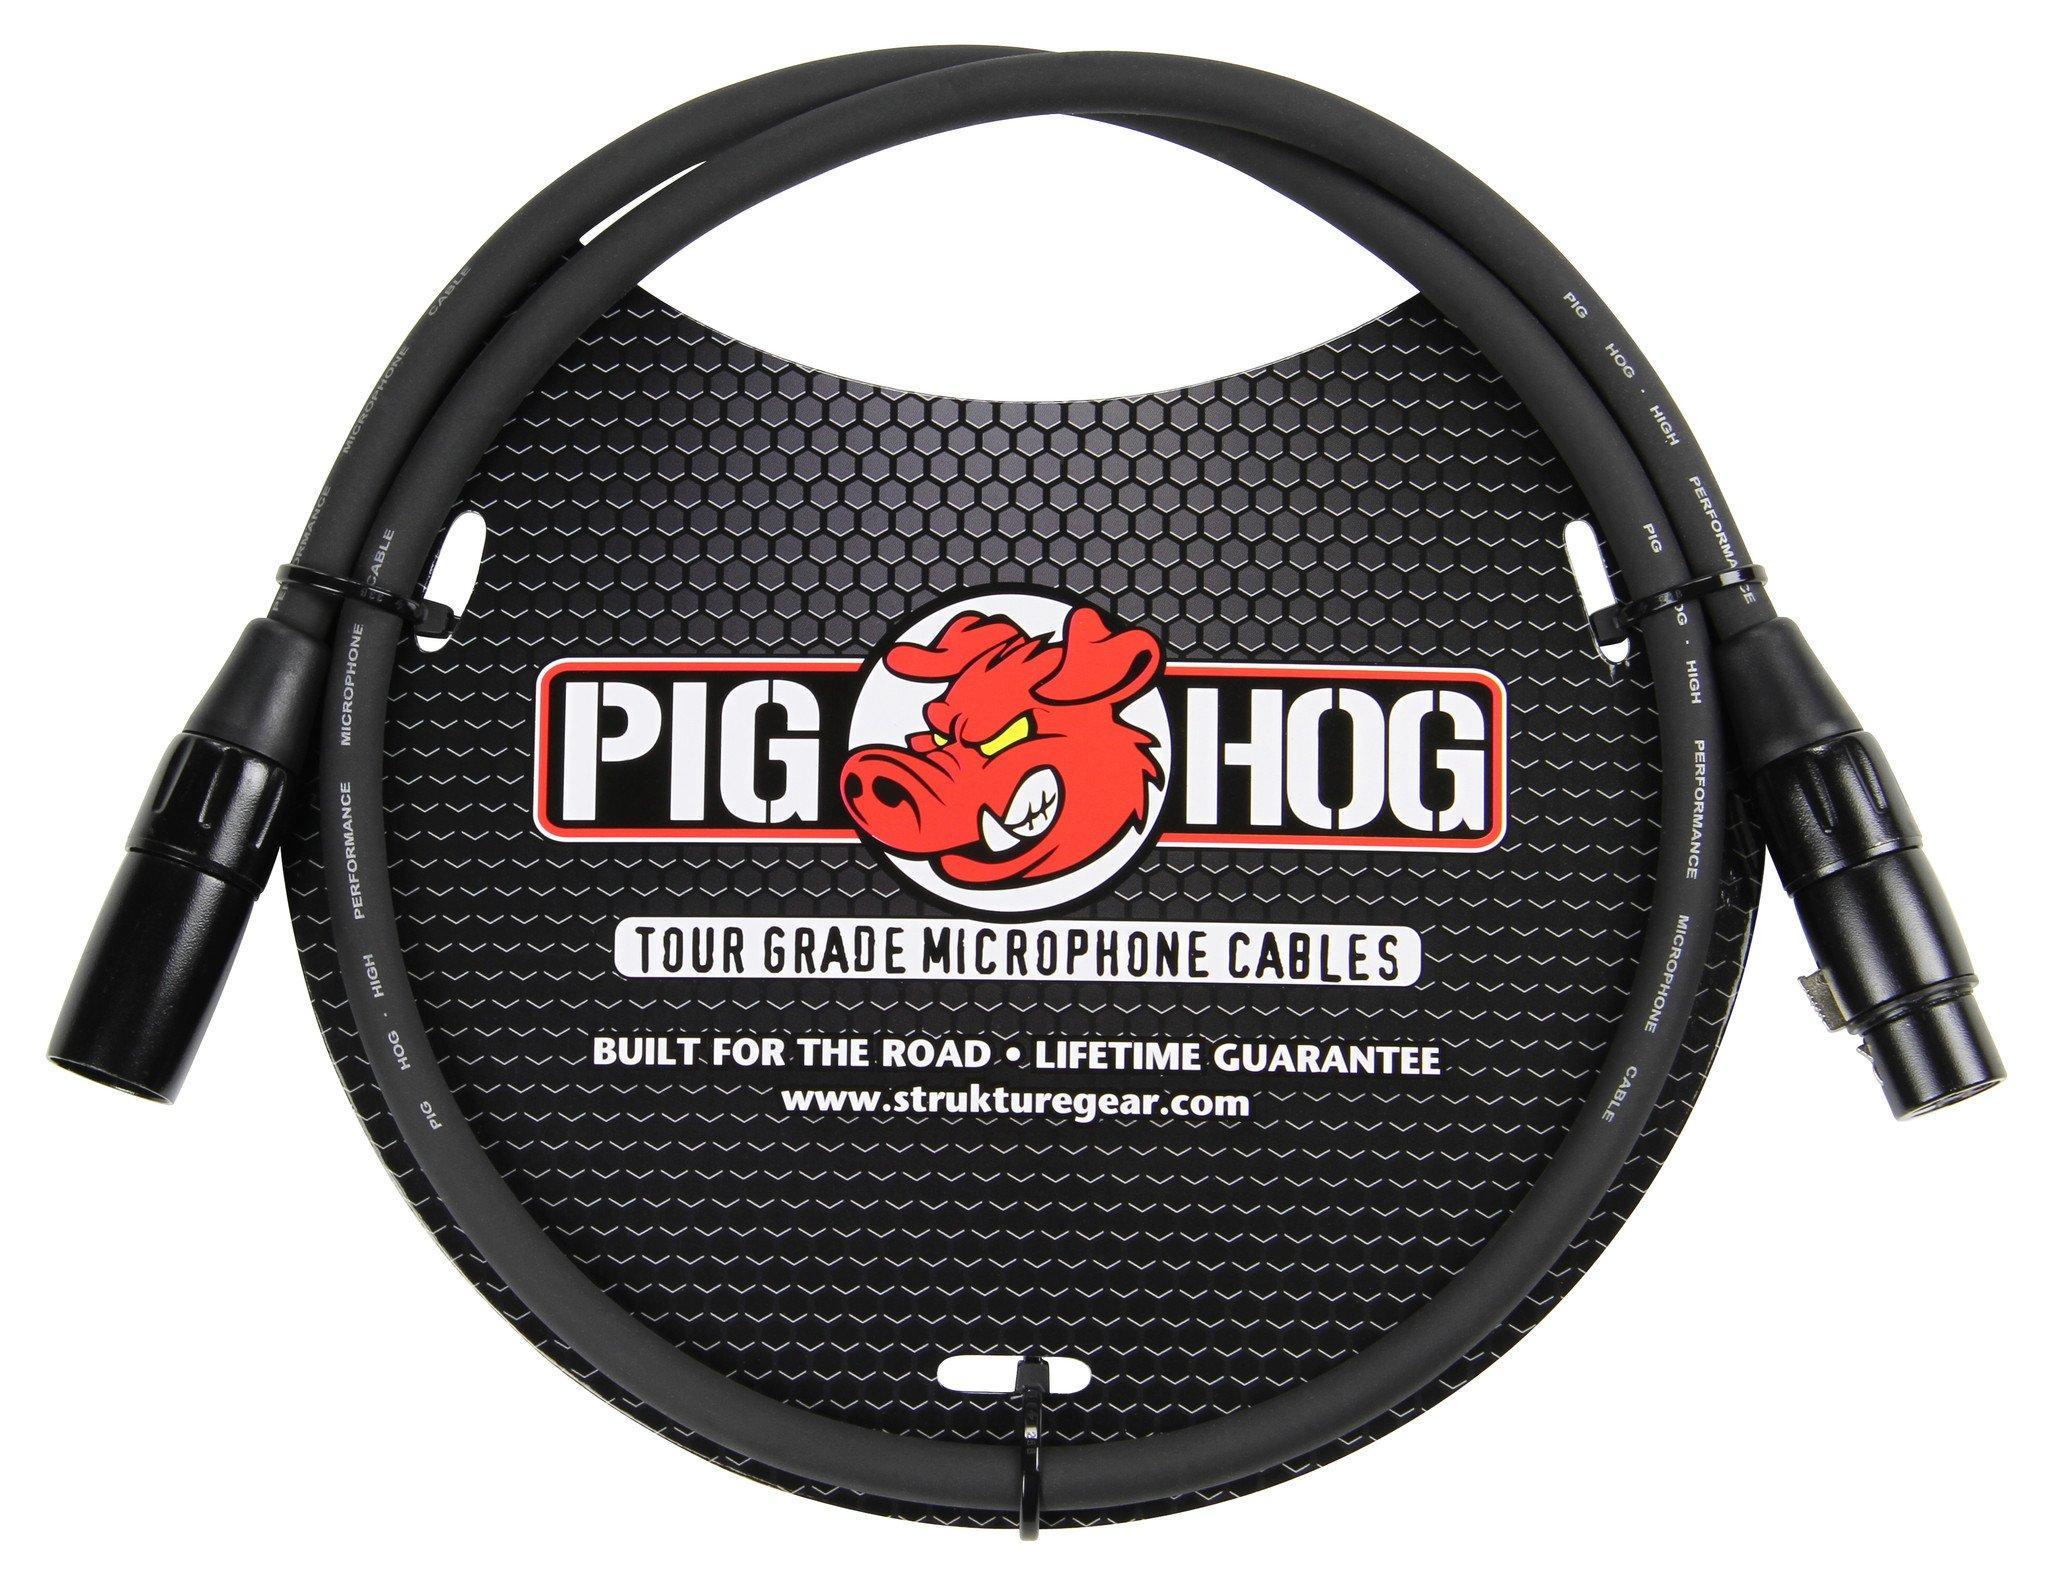 Pig Hog 8mm Mic Cable, 3ft XLR